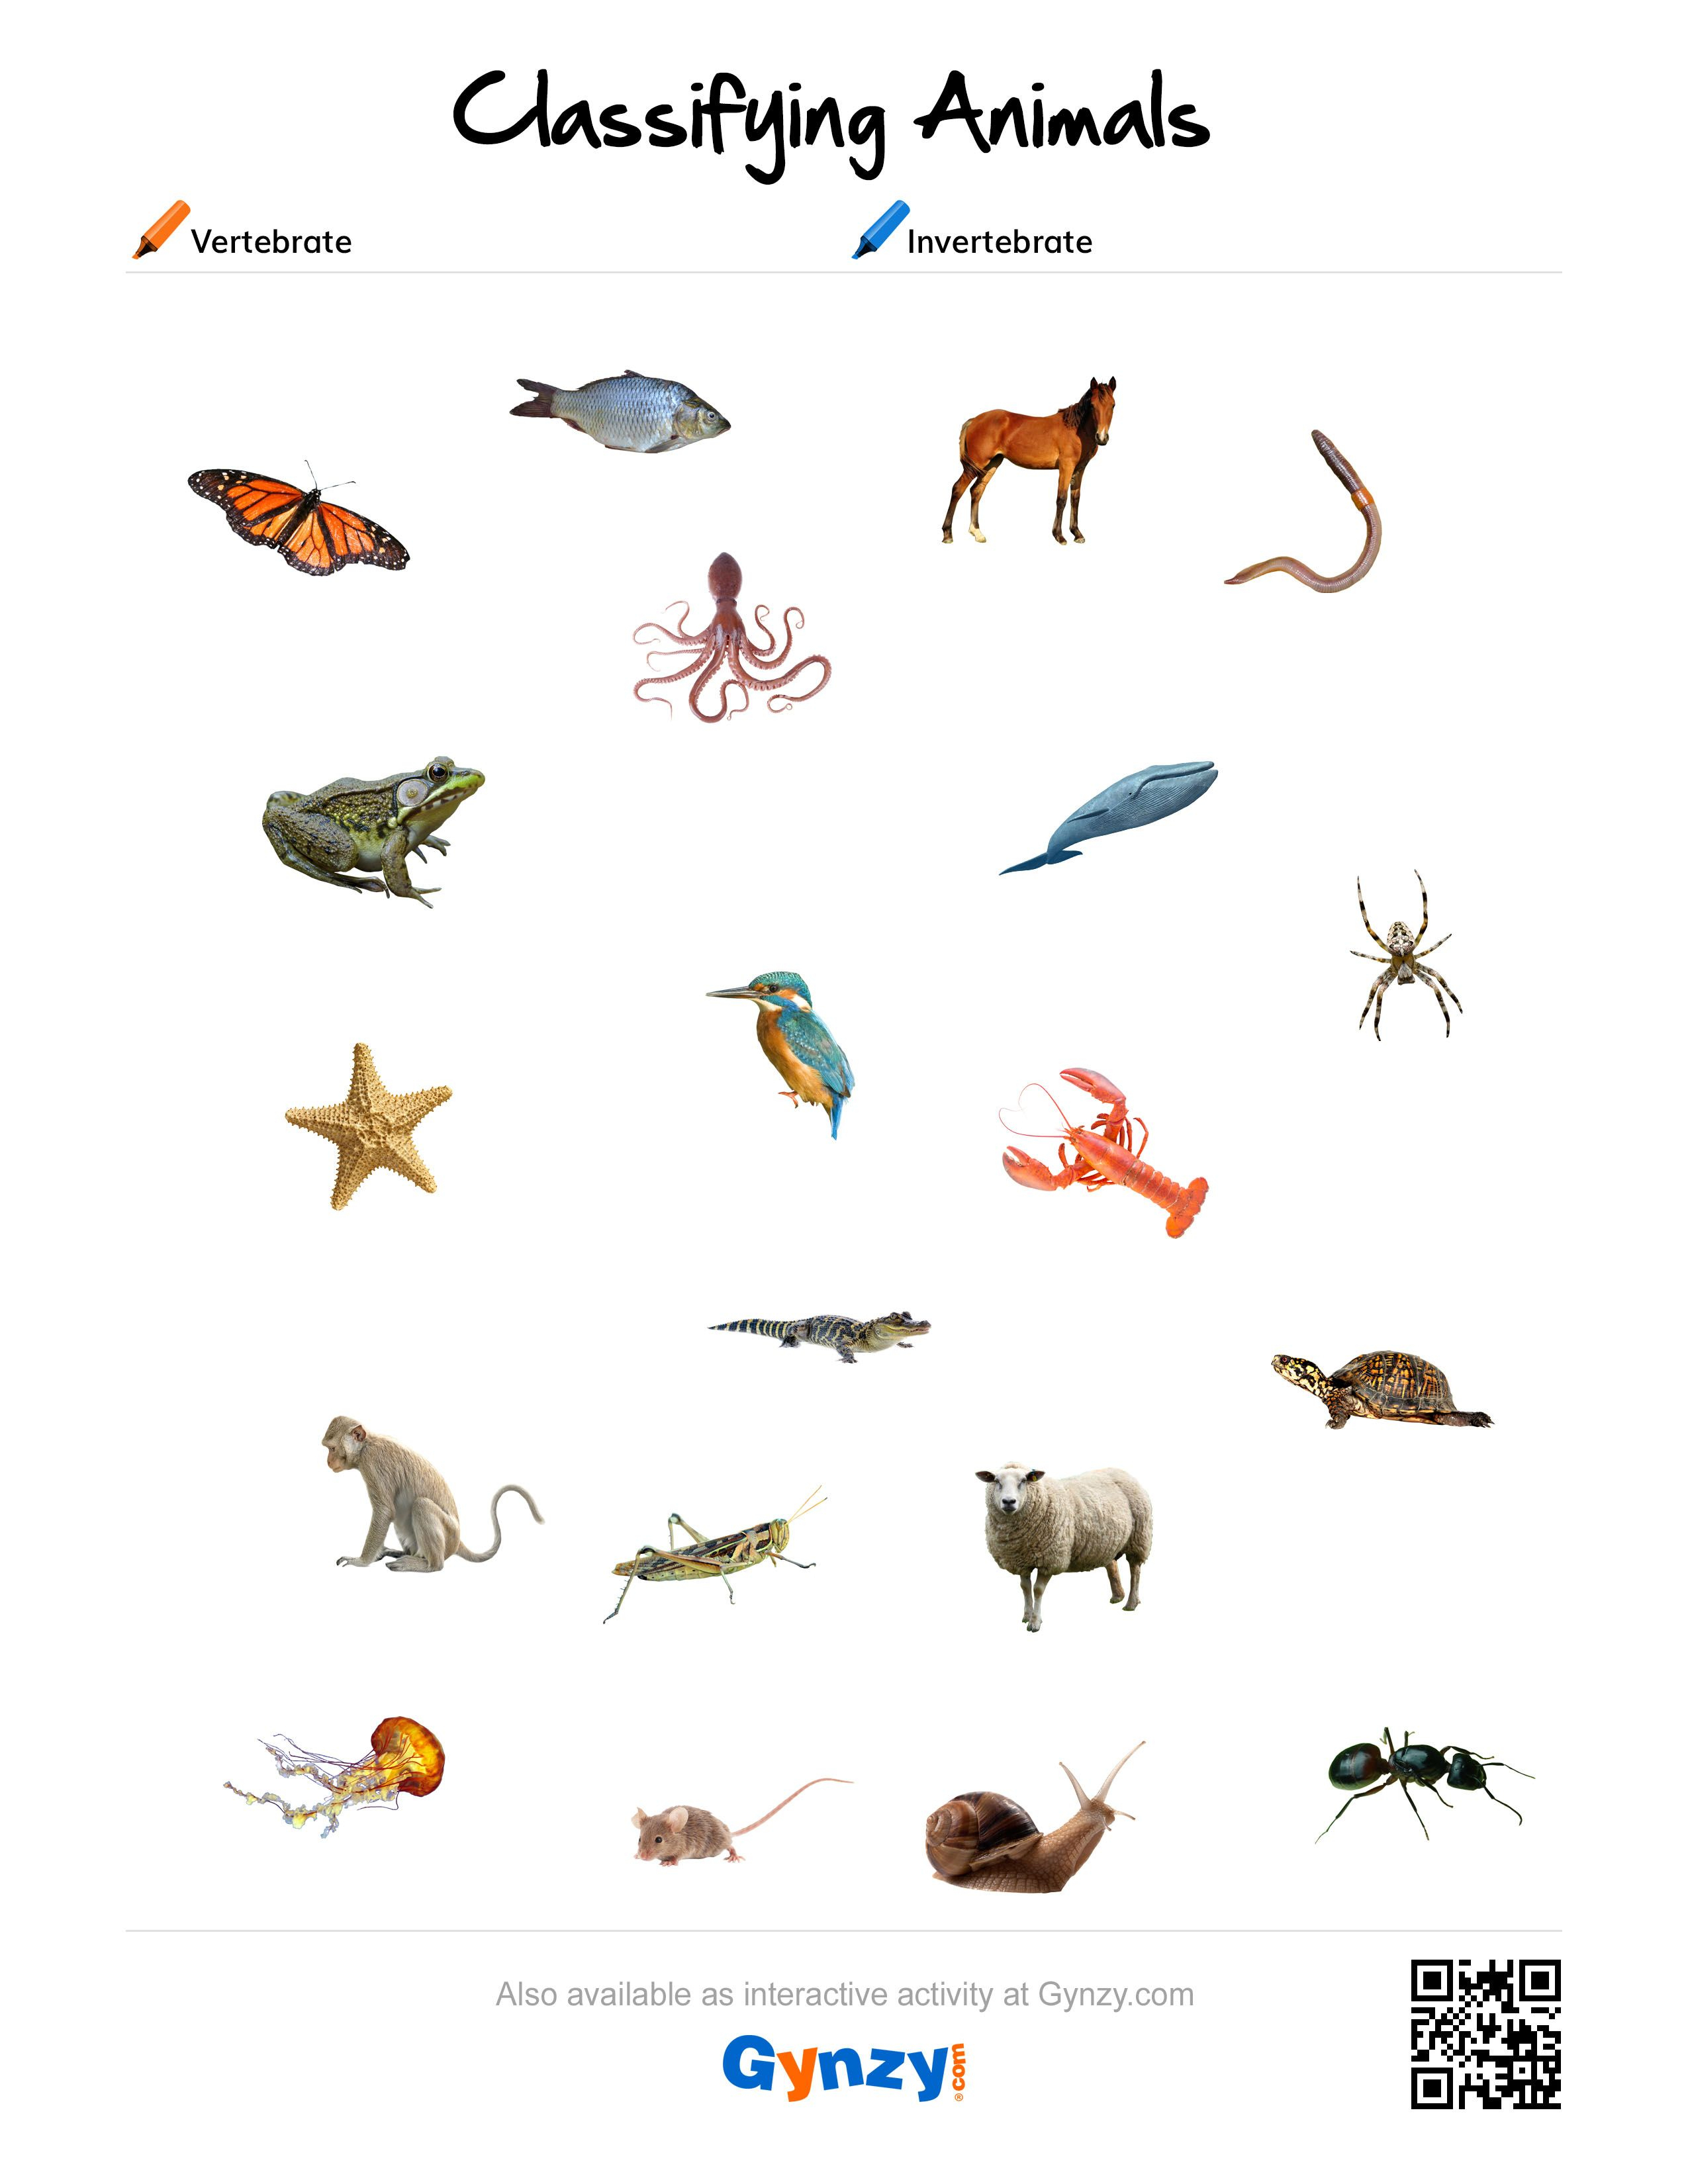 Pinteacher Timo On Classifying Animals | Classes Of Vertebrates | Free Printable Worksheets On Vertebrates And Invertebrates